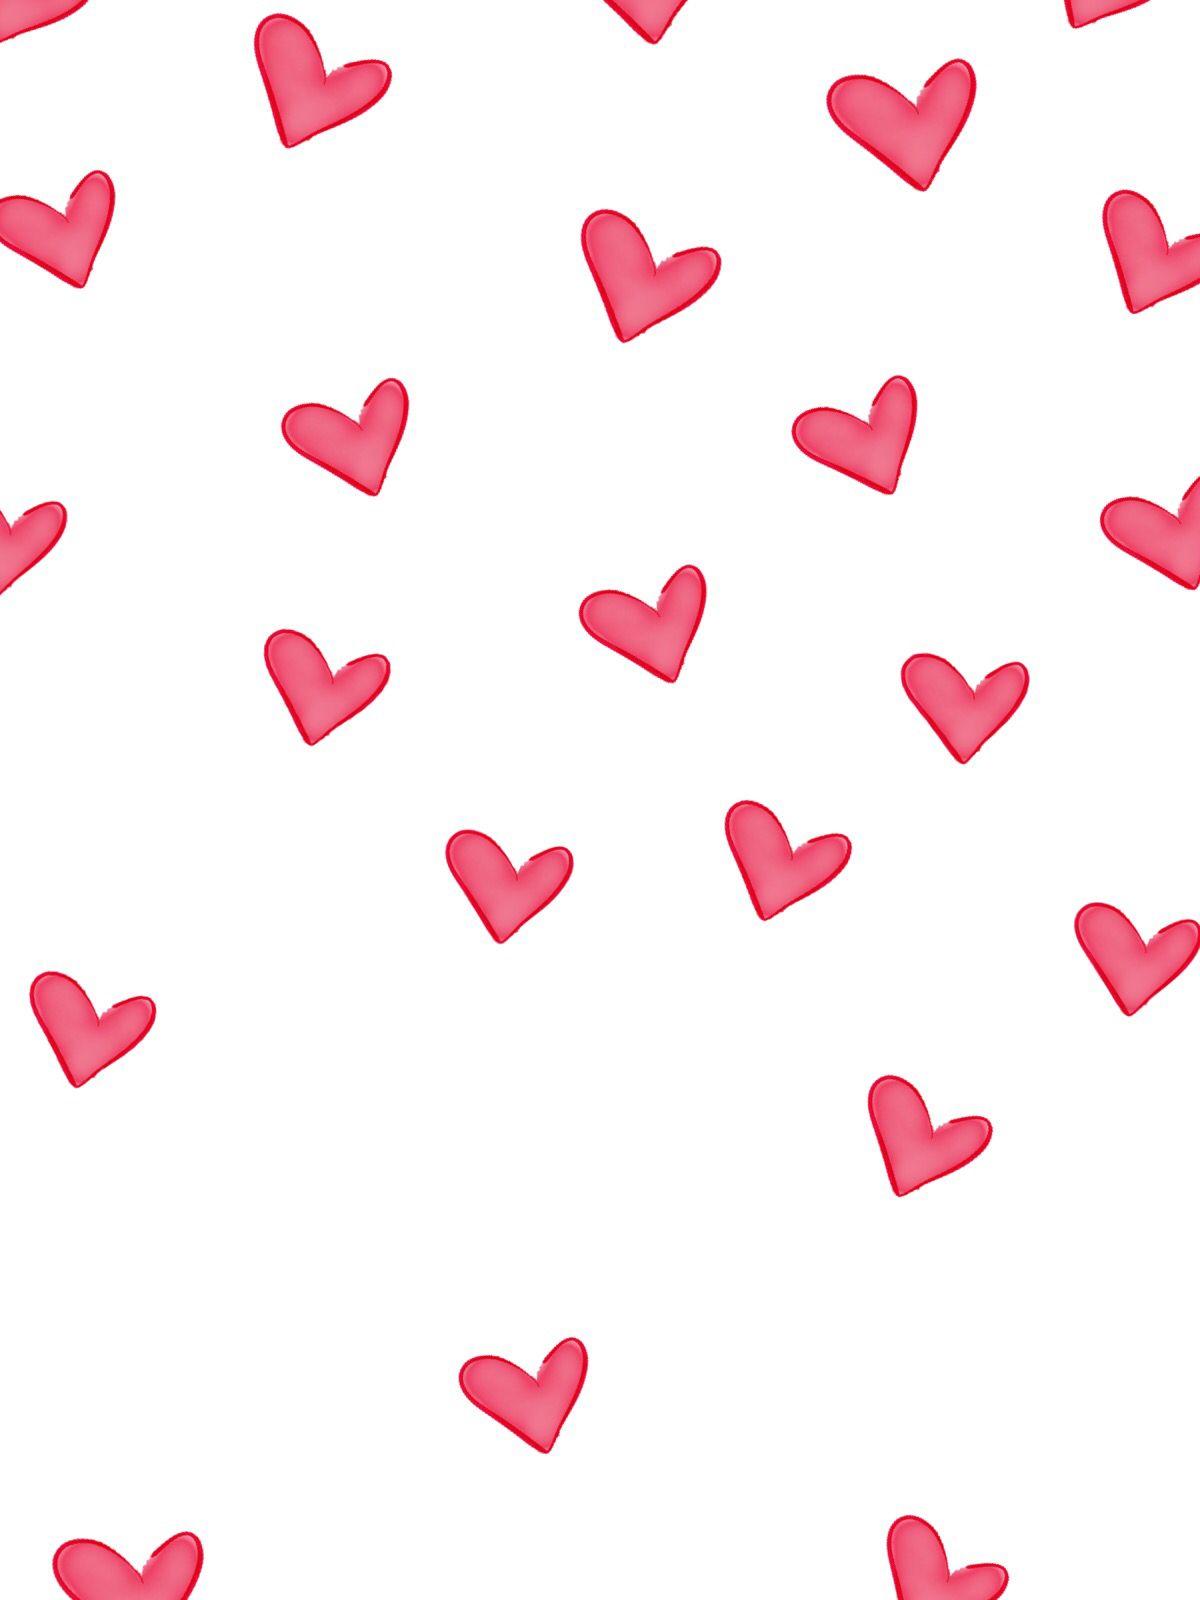 Cute valentine wallpaper Fondos de pantalla, Fondos